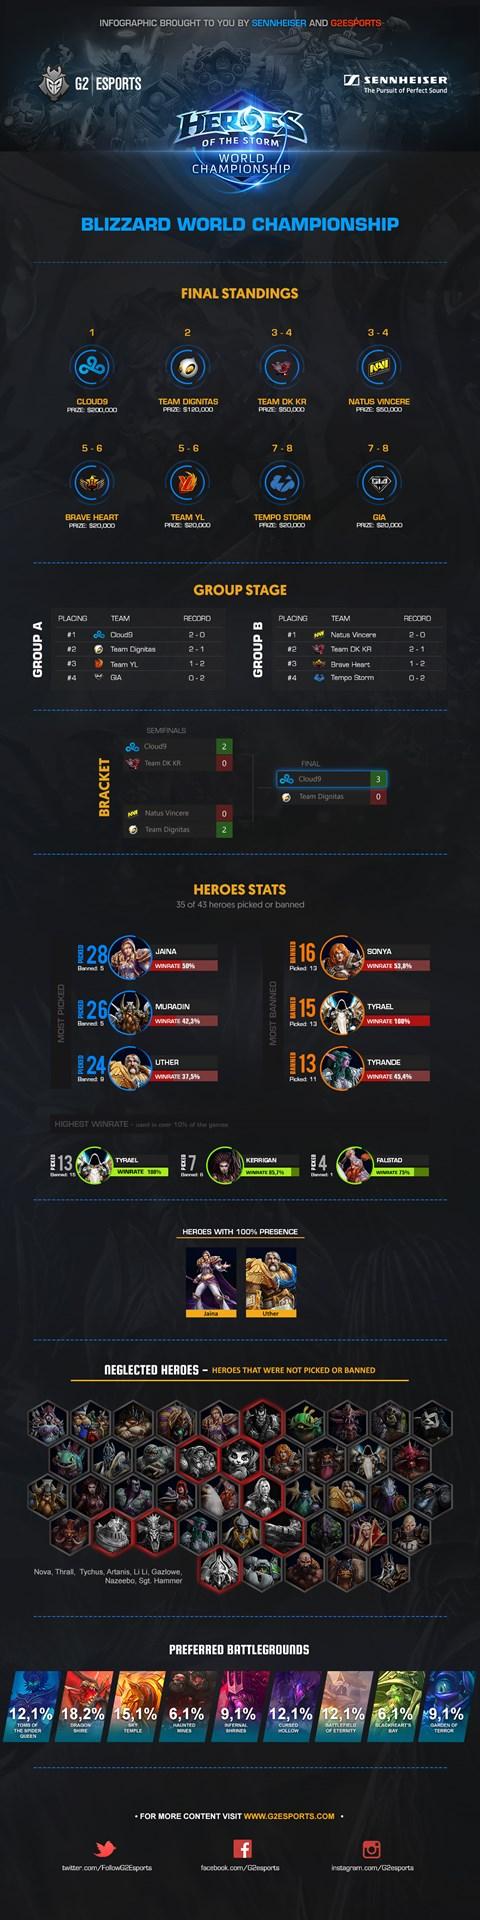 blizzcon-world-championship